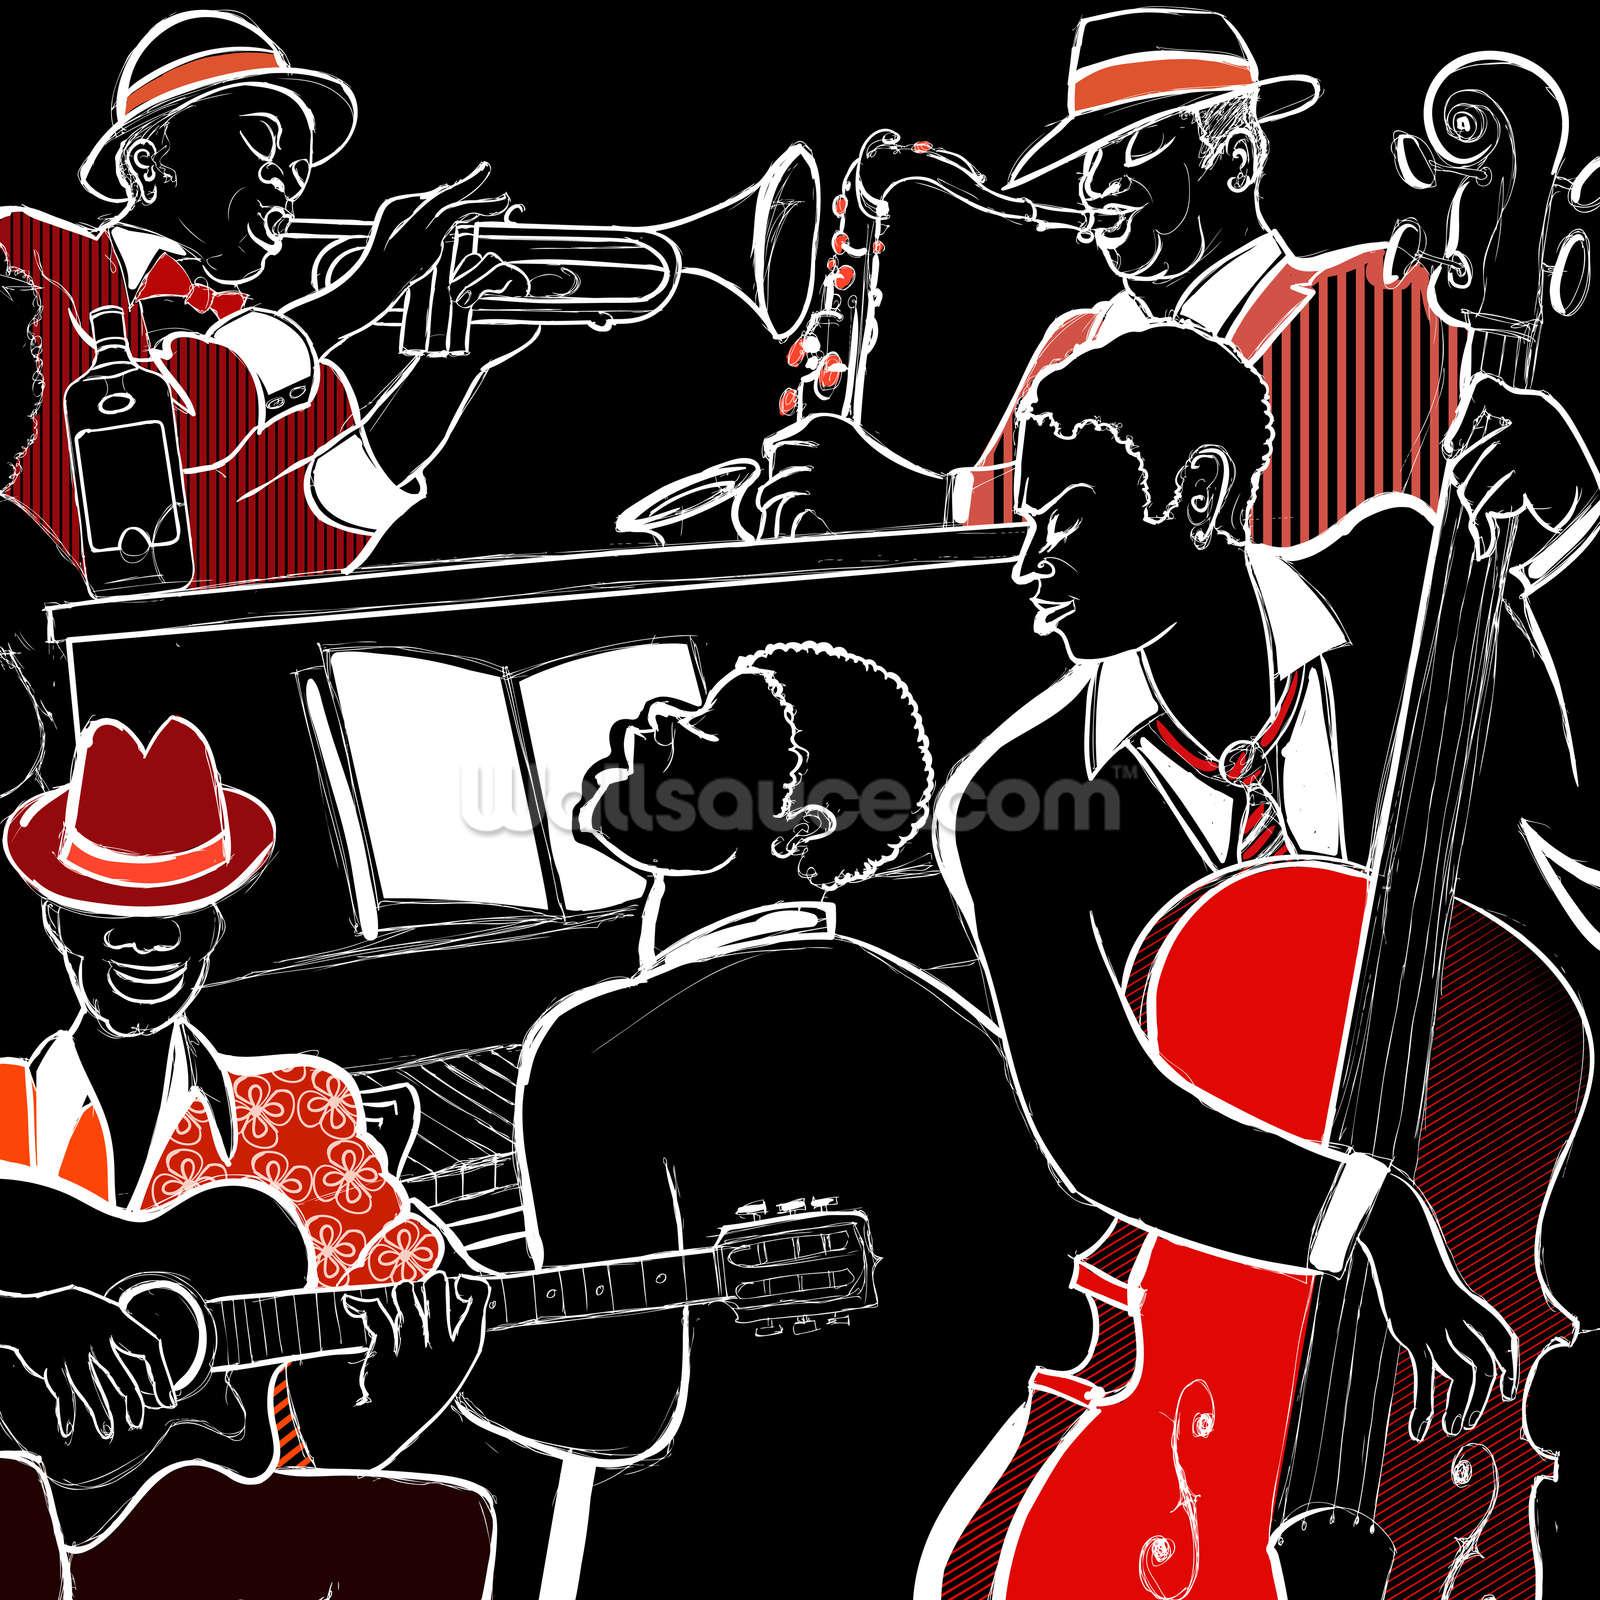 jazz band wallpapers - photo #12